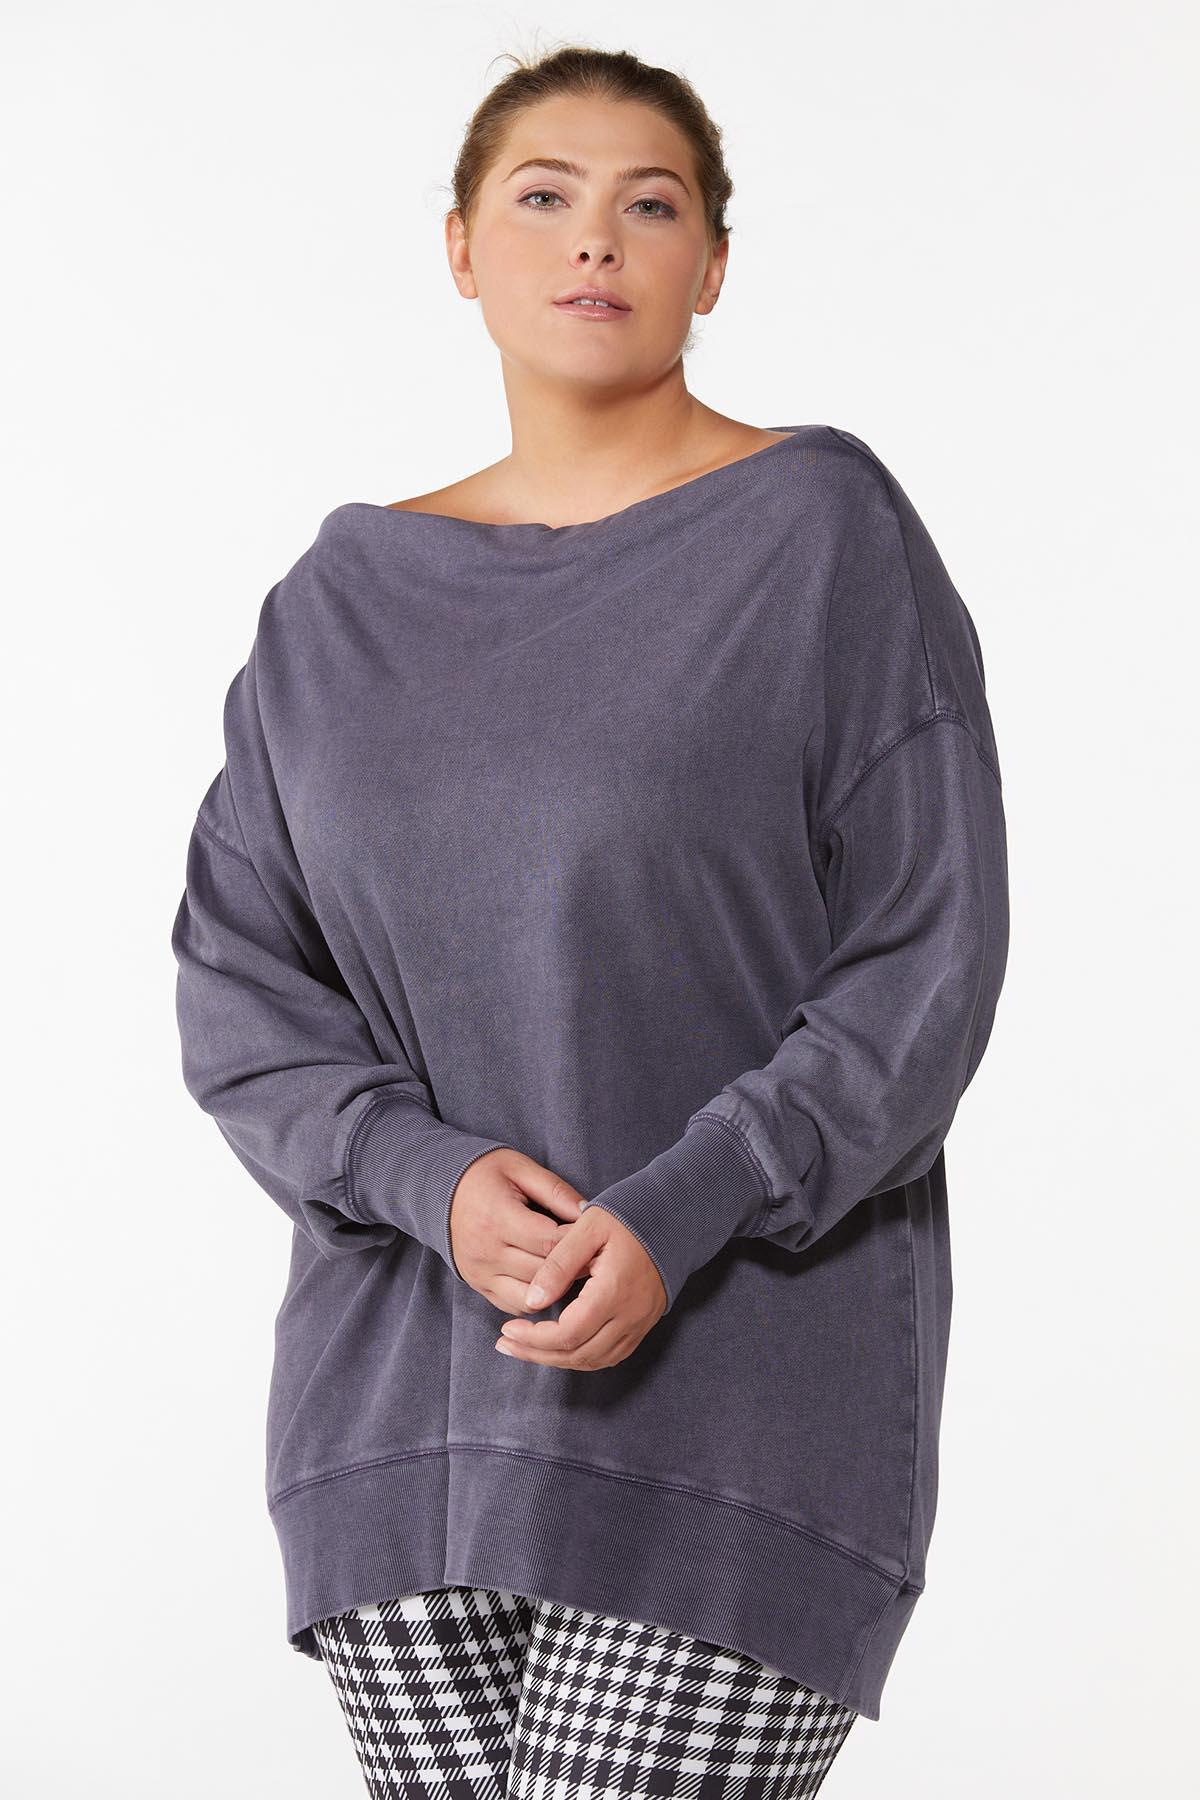 Plus Size Slouch Oversized Sweatshirt